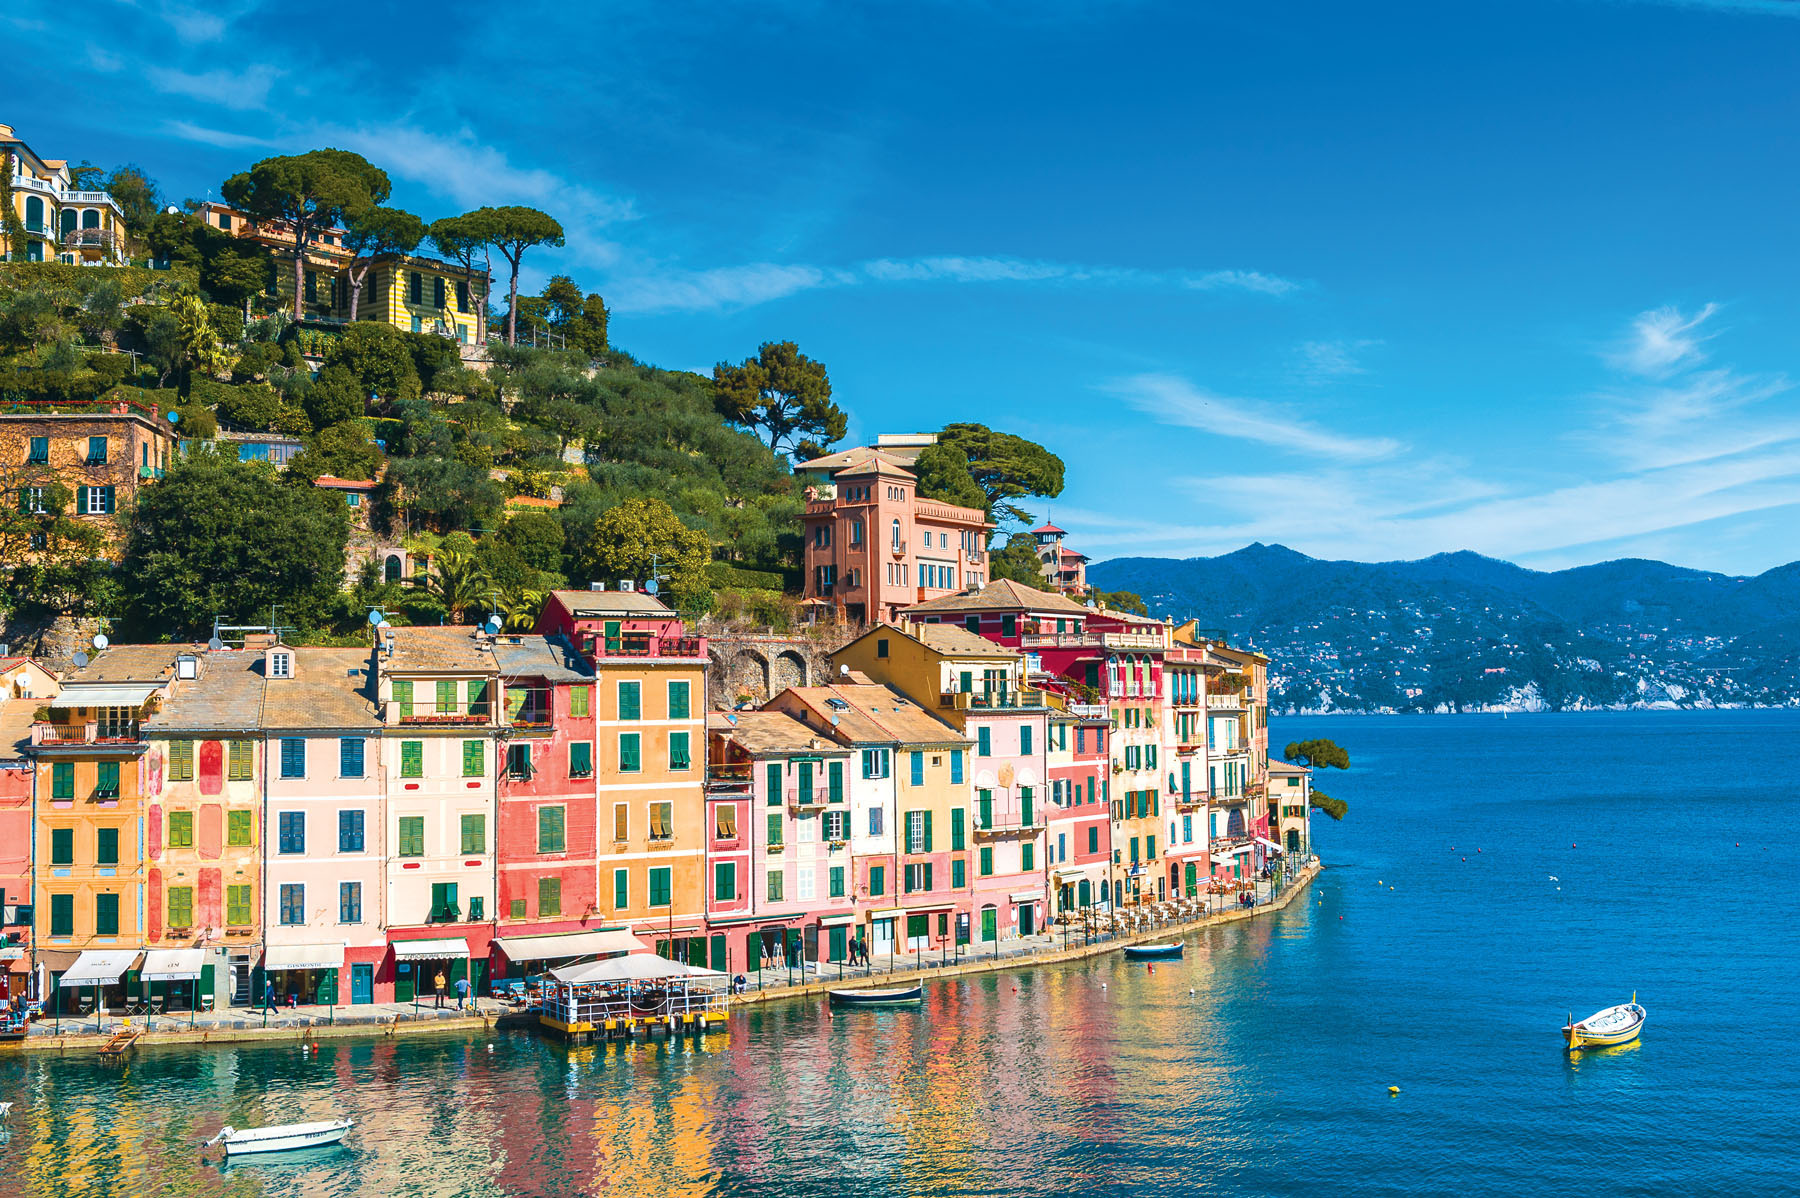 Italy-Portofino_259785722_1